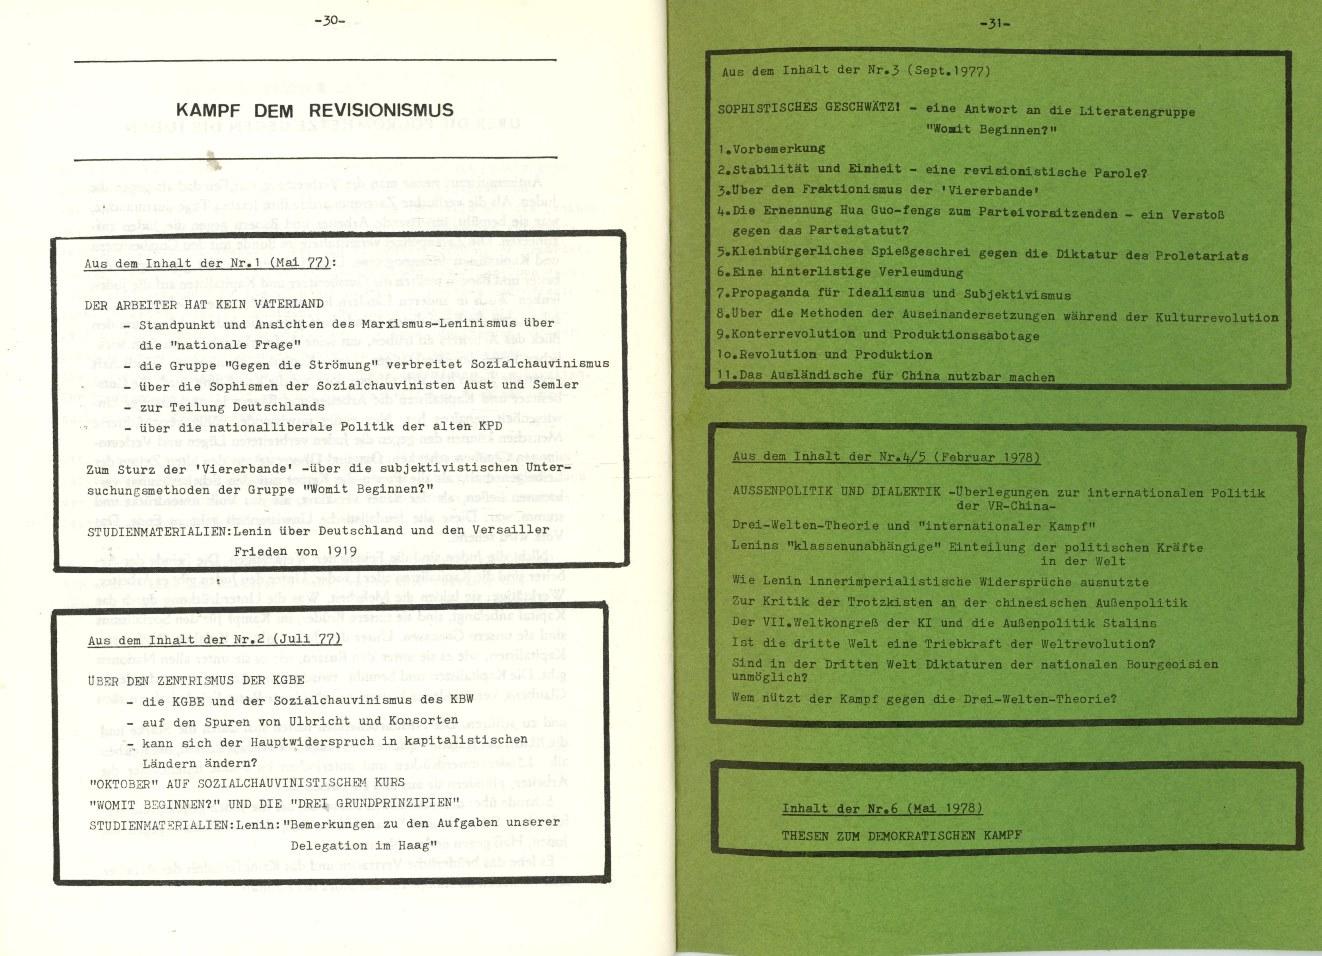 Muenchen_Kampf_dem_Revisionismus_1978_08_16